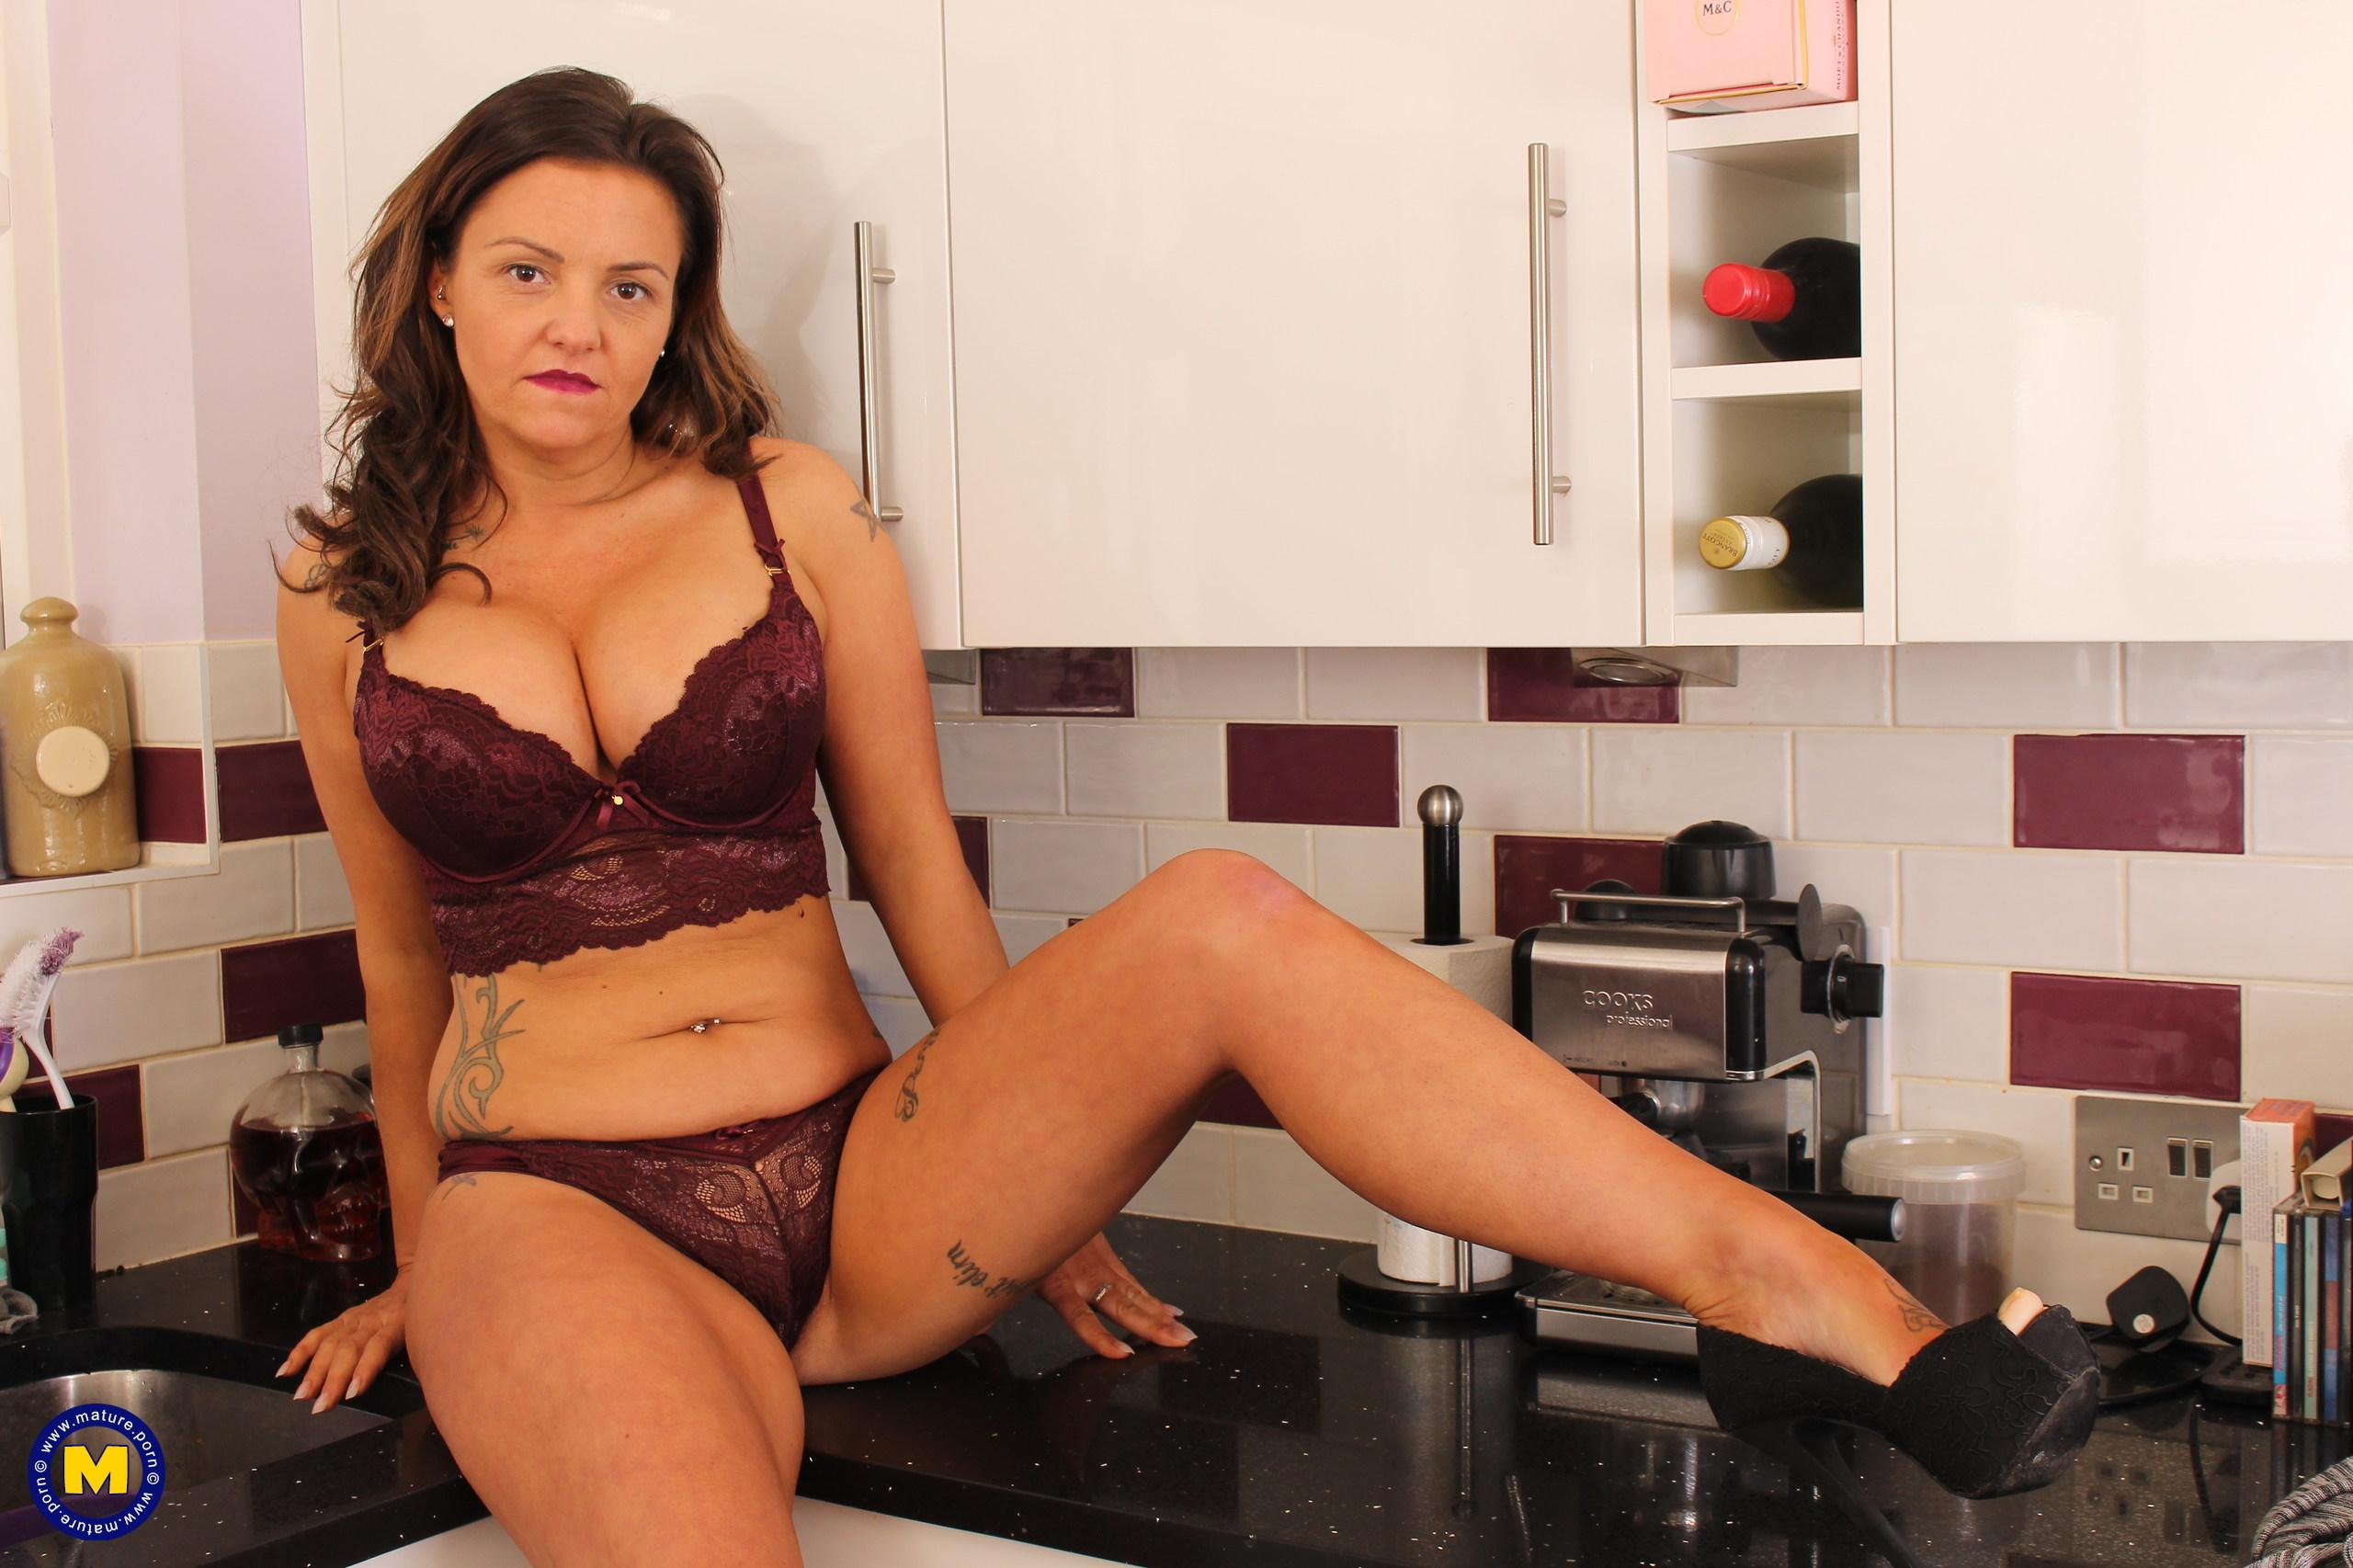 Sienna hudson hot milf sex addict